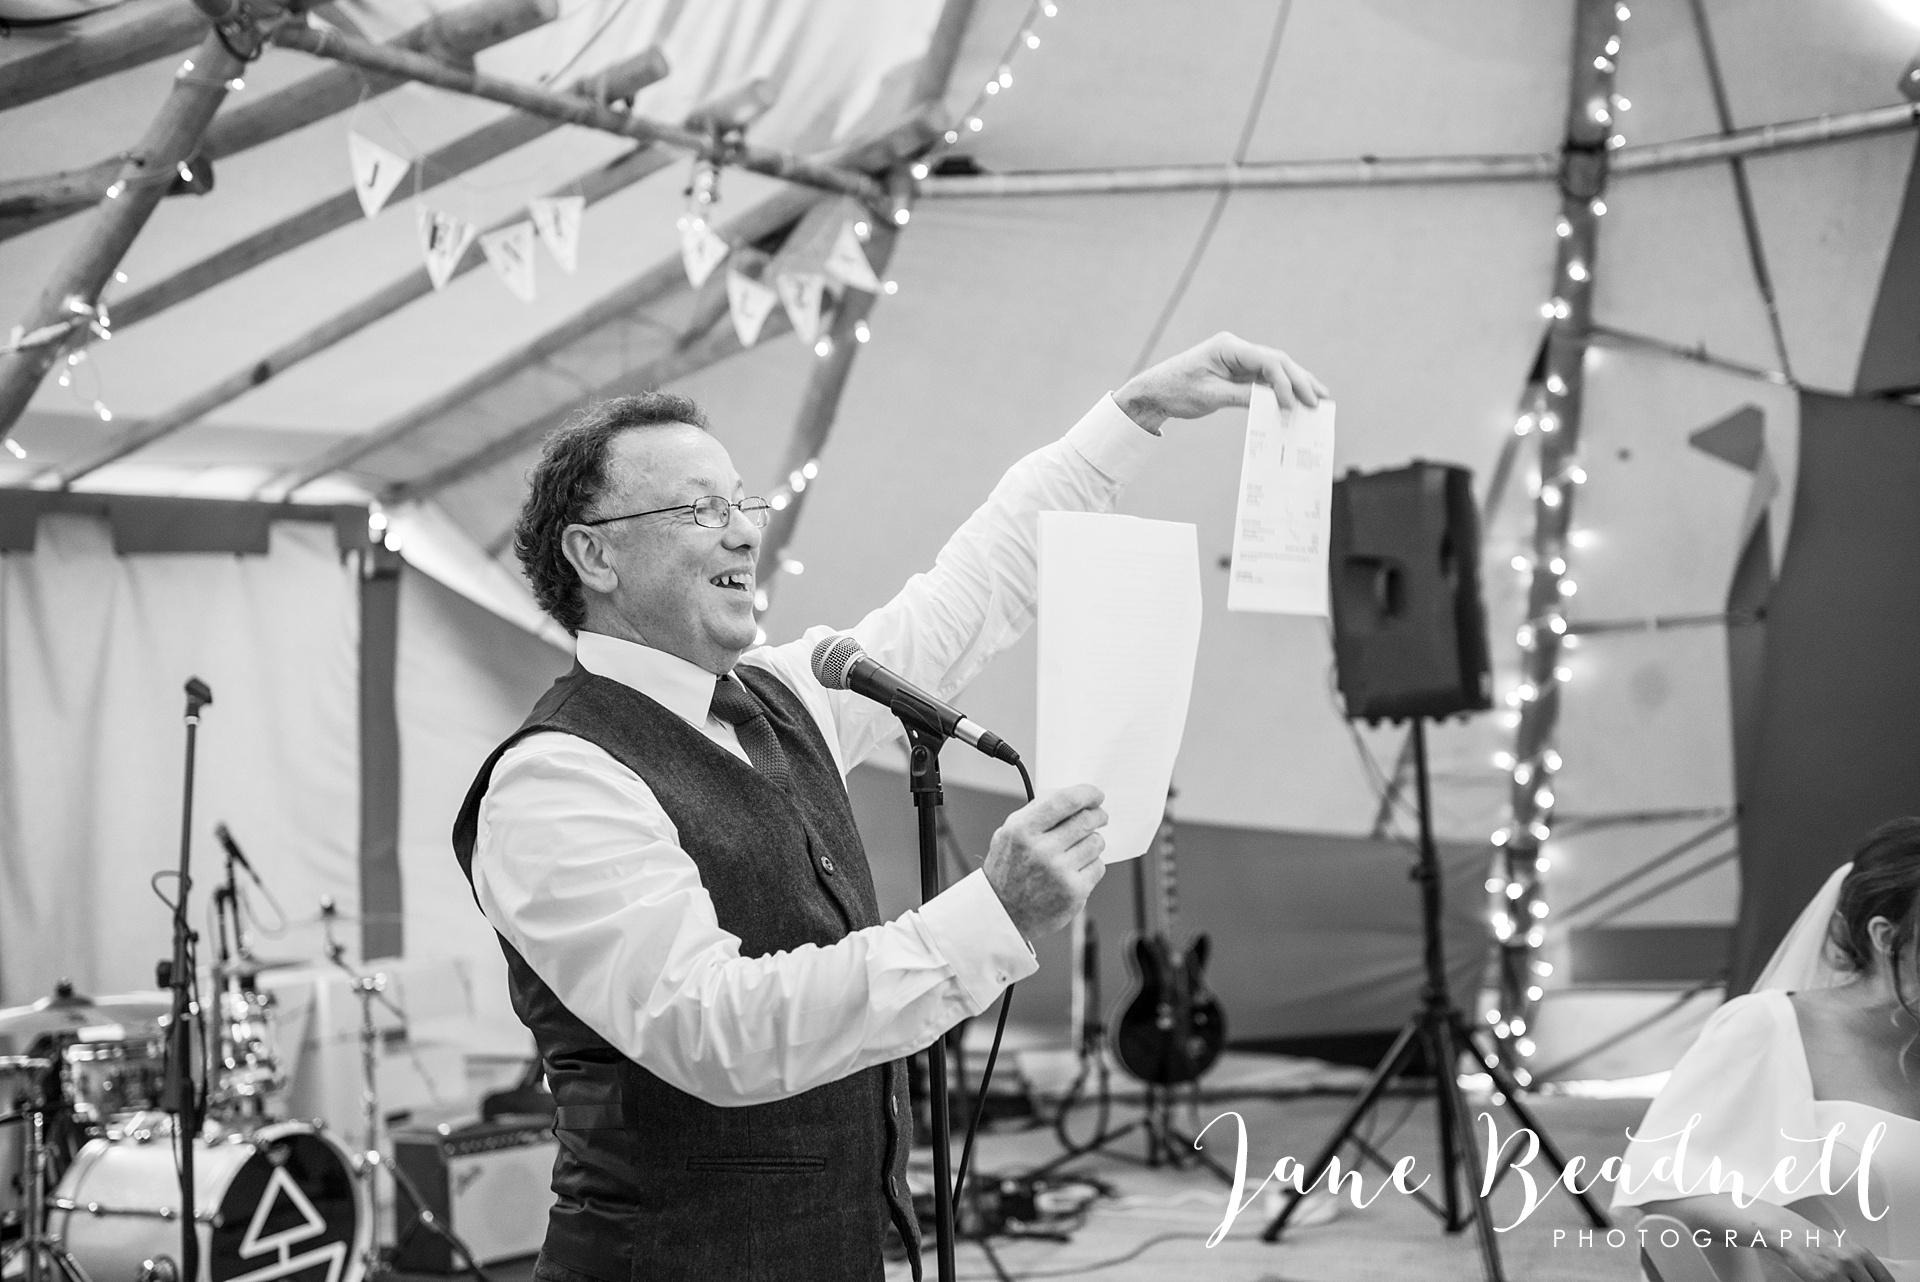 fine-art-wedding-photographer-jane-beadnell-yorkshire-wedding-photographer_0136